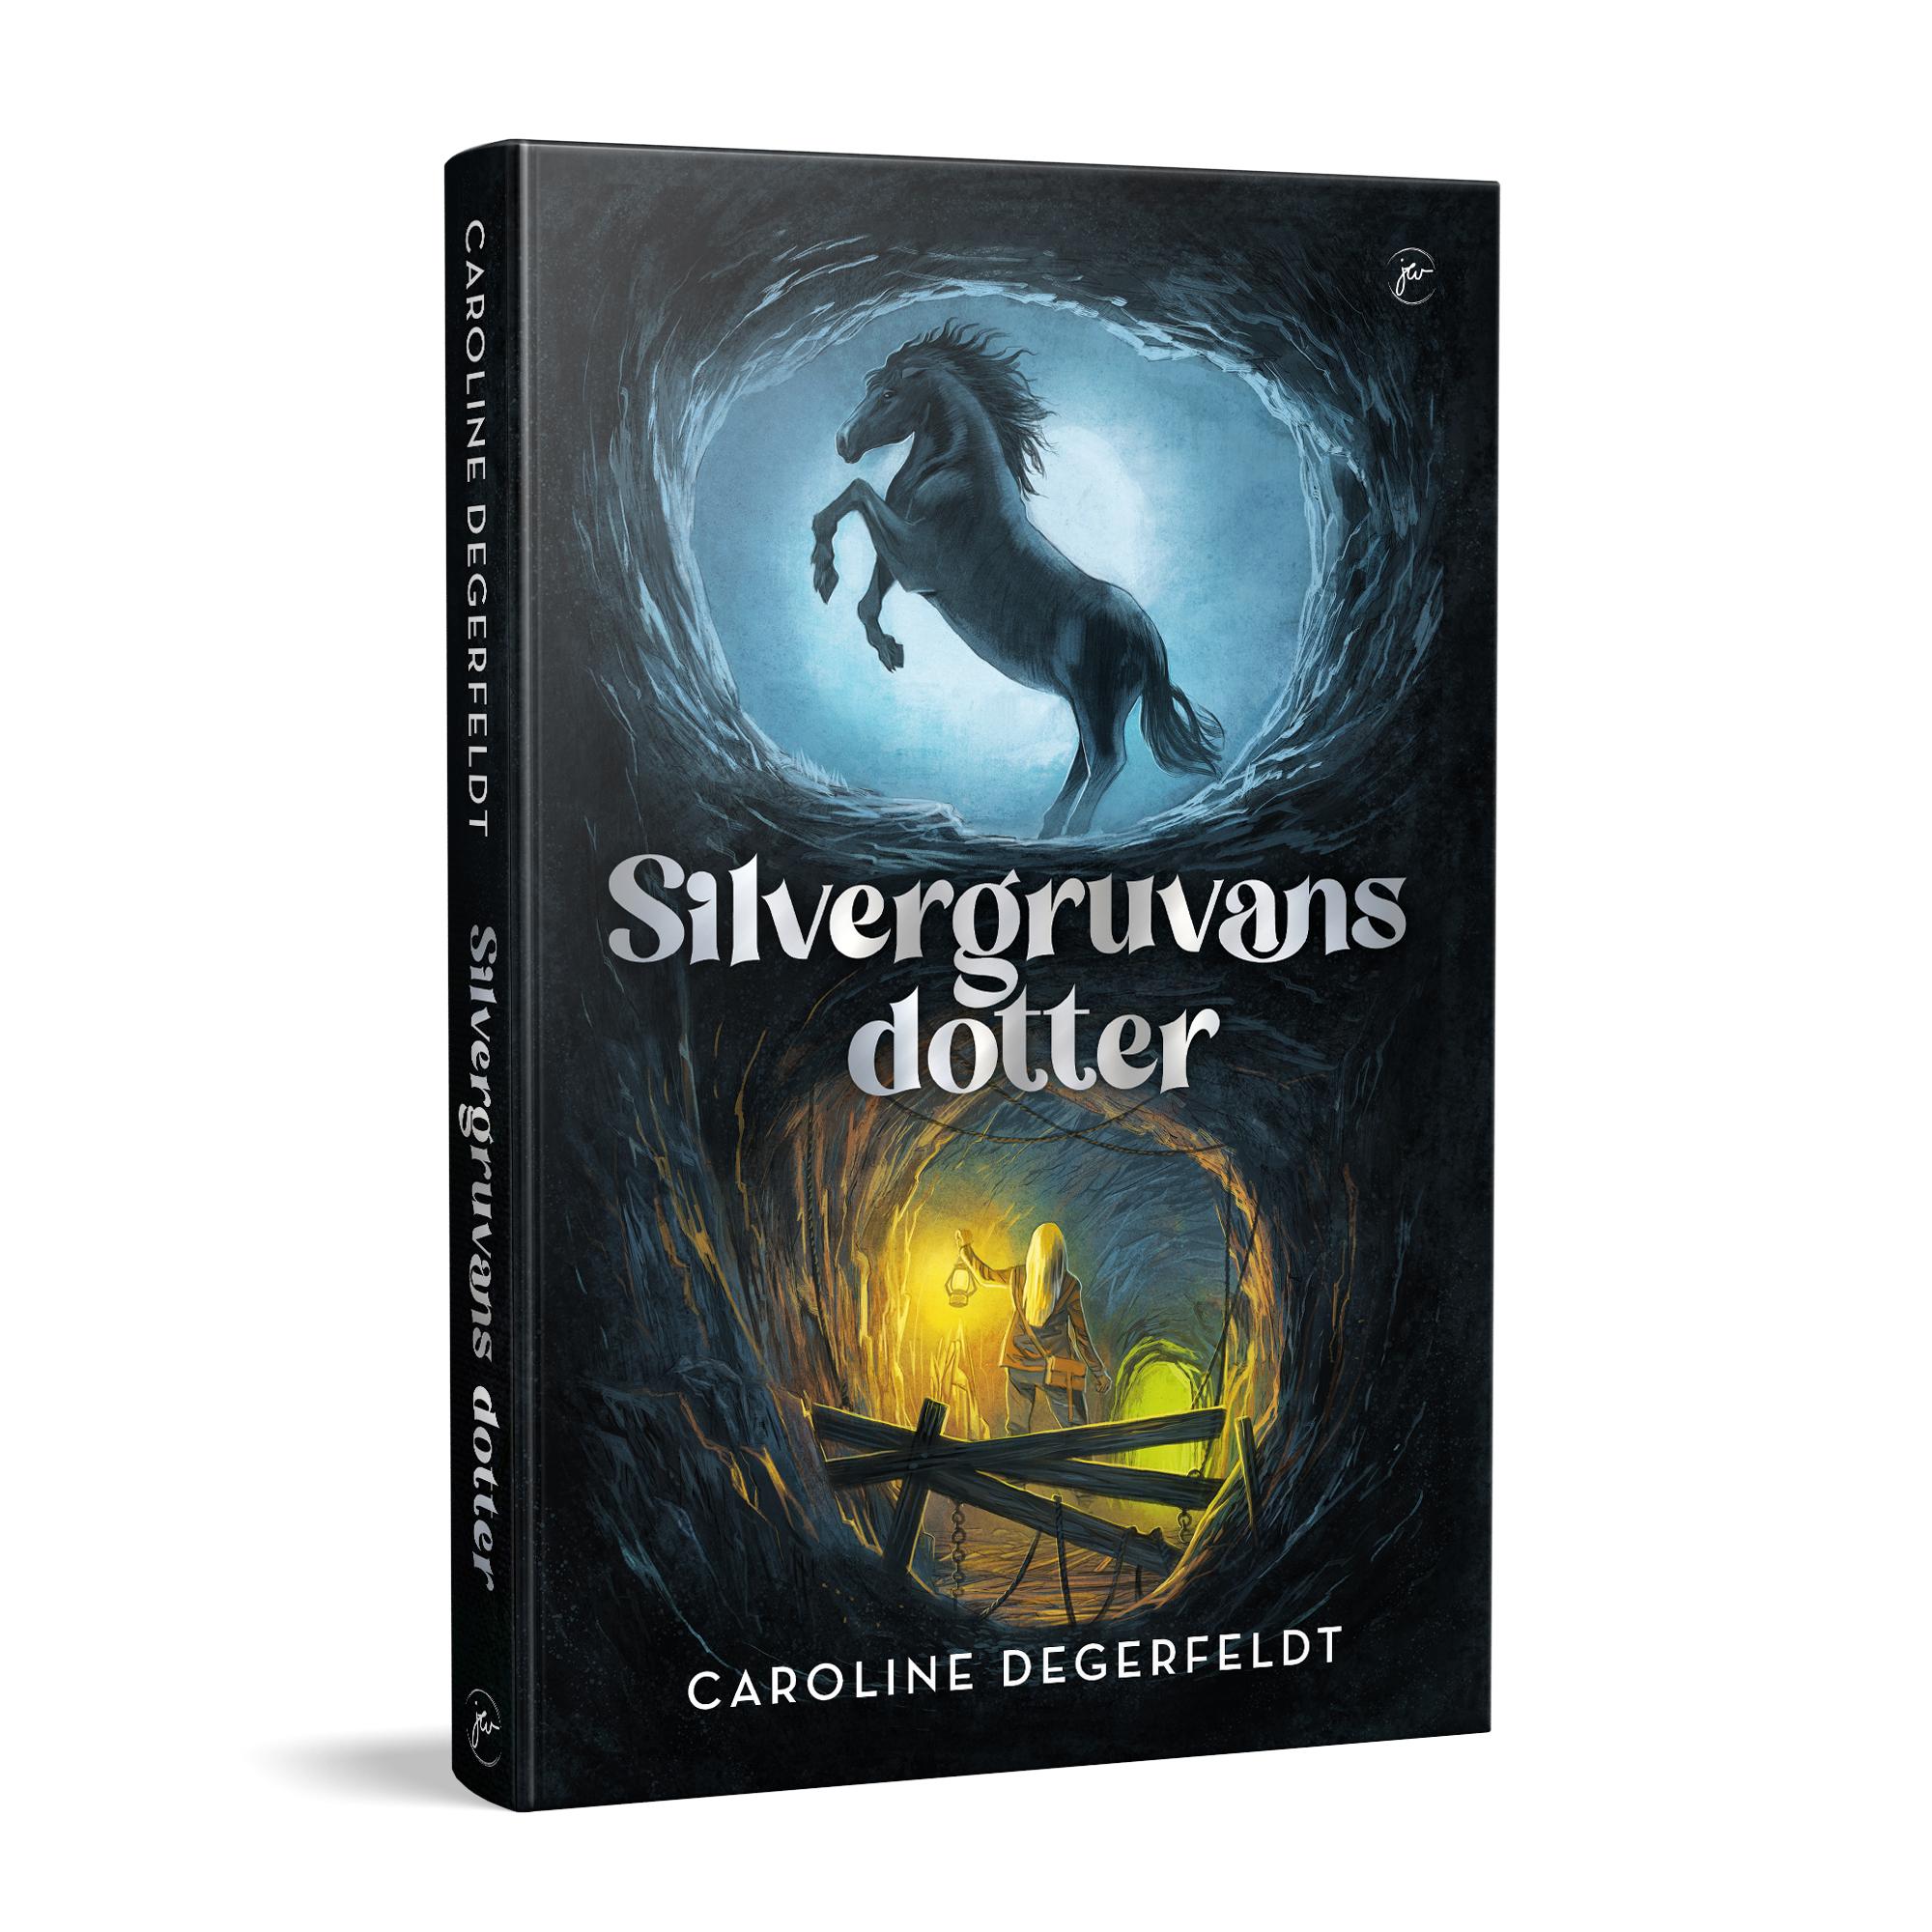 Silvergruvans dotter - Caroline Degerfeldt